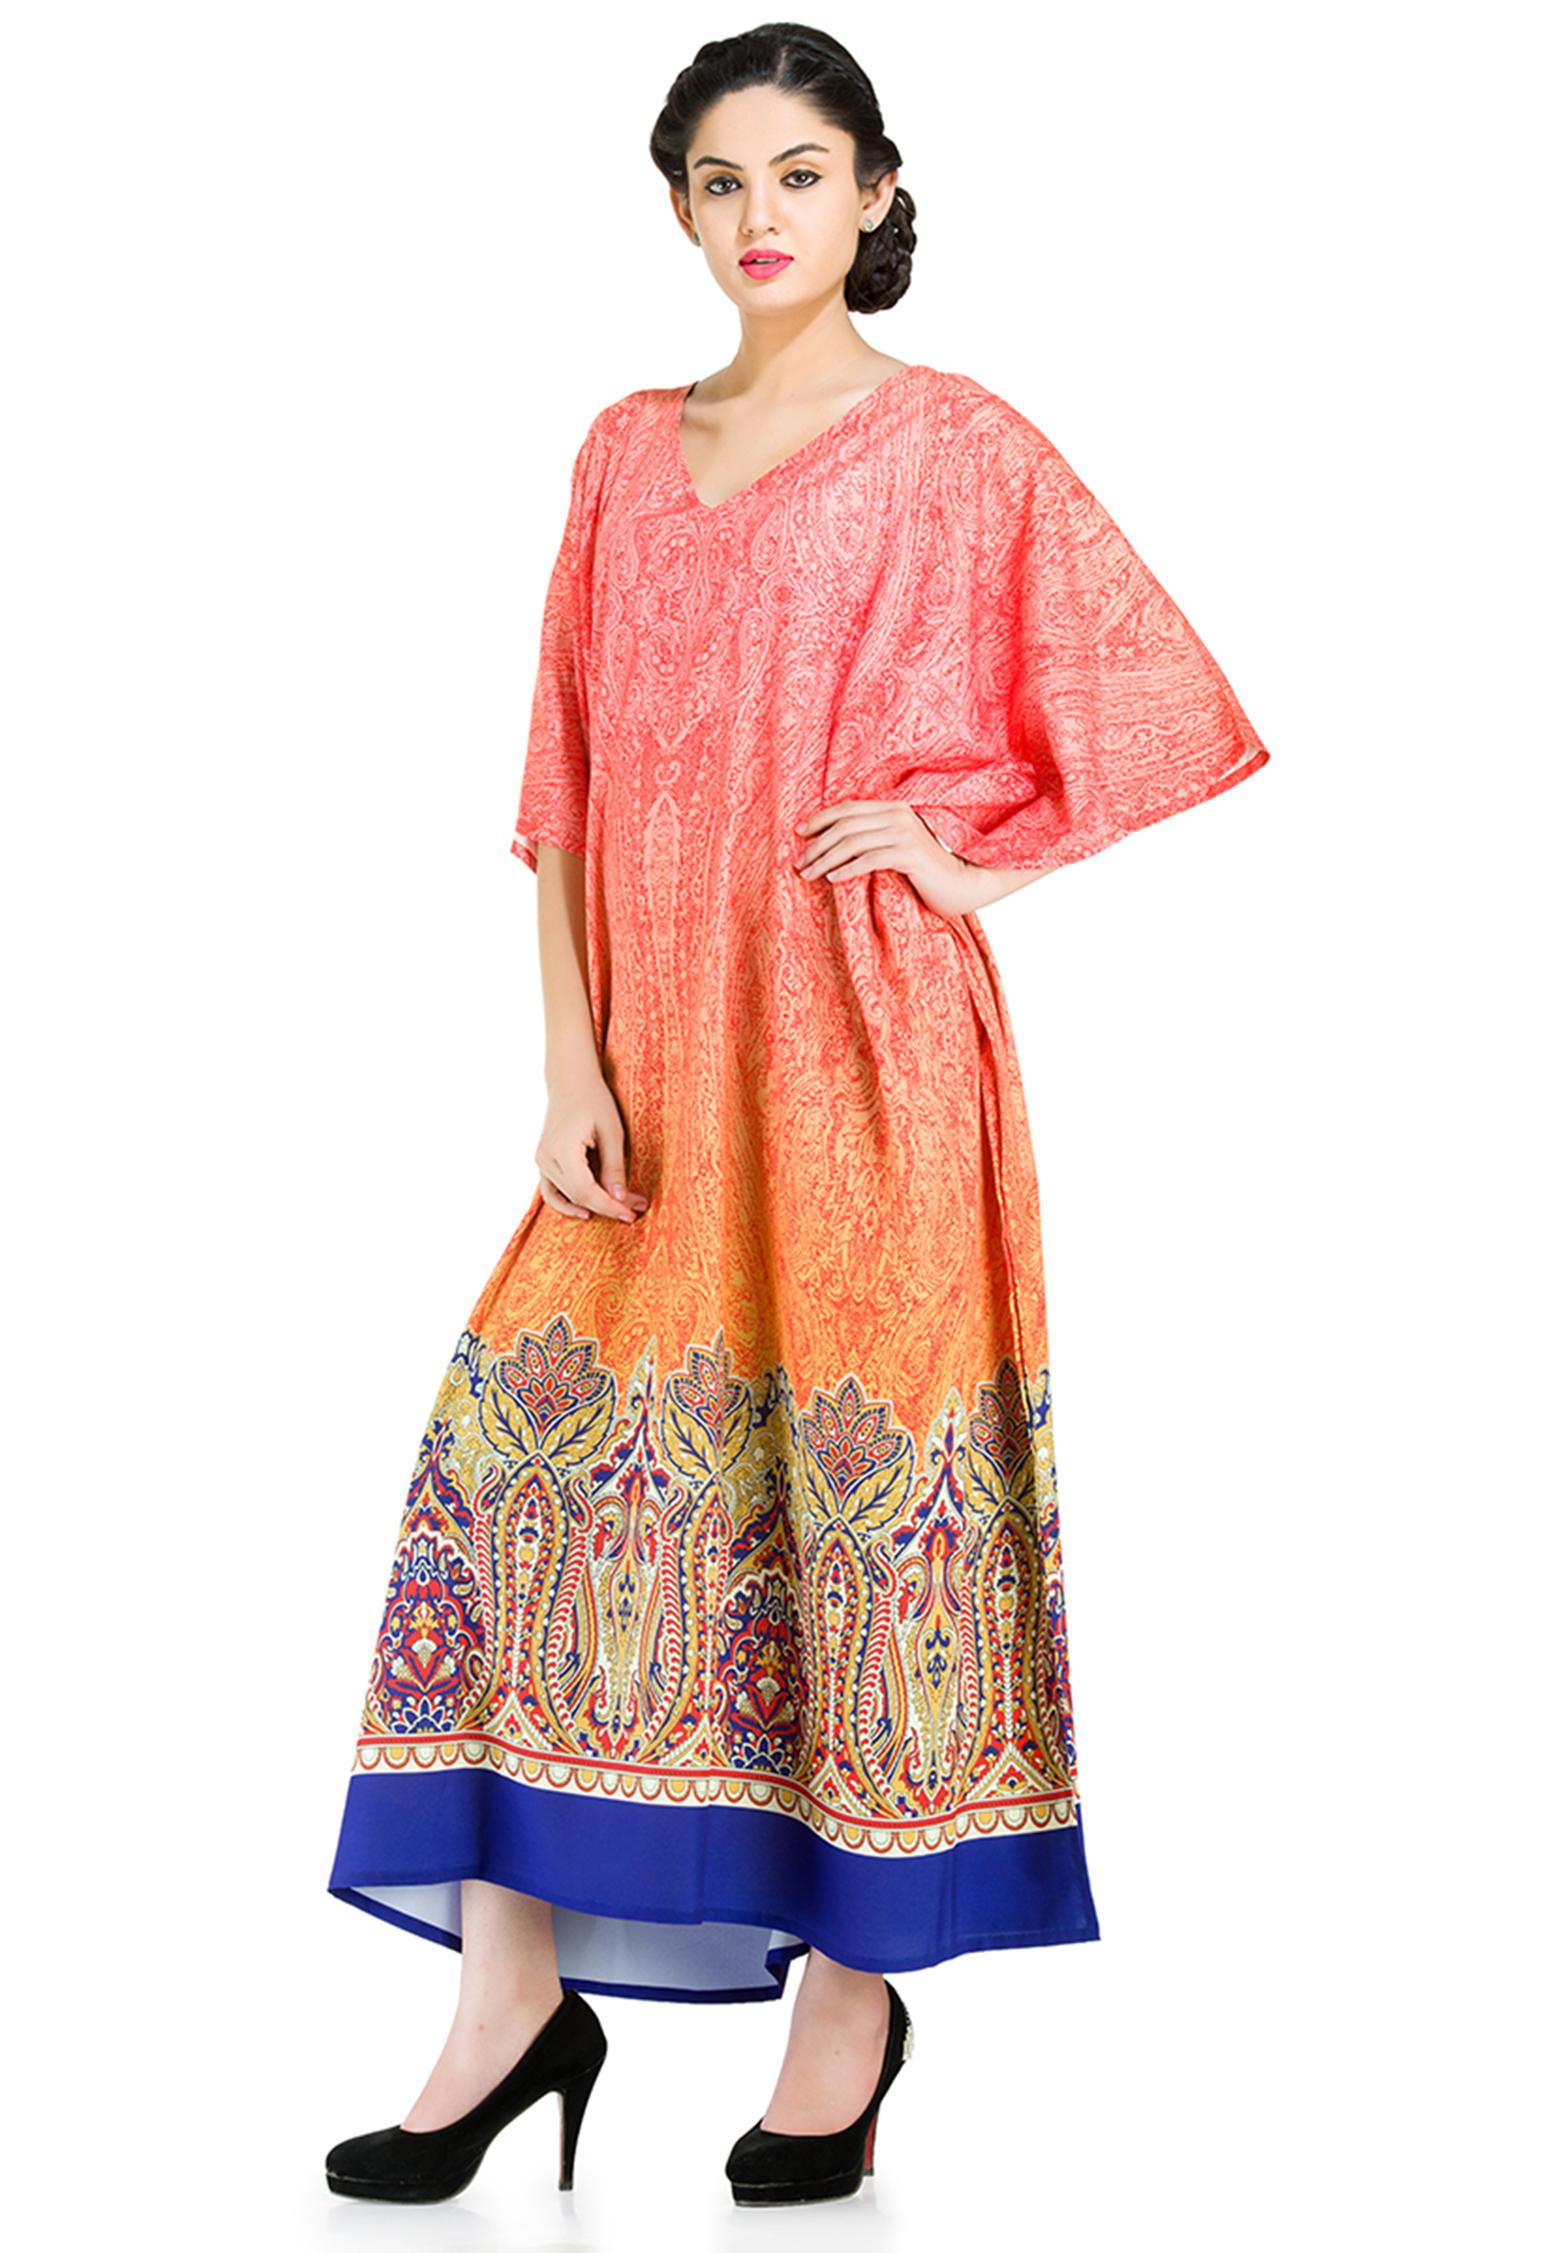 16c6ba2534862 Goood Times - Multicolor Kaftan Dresses for Women Summer Beach Wear Kimono  Maxi Cover Up Women's Long Caftan Dresses for Women Loose Floral Kaftans  Night ...